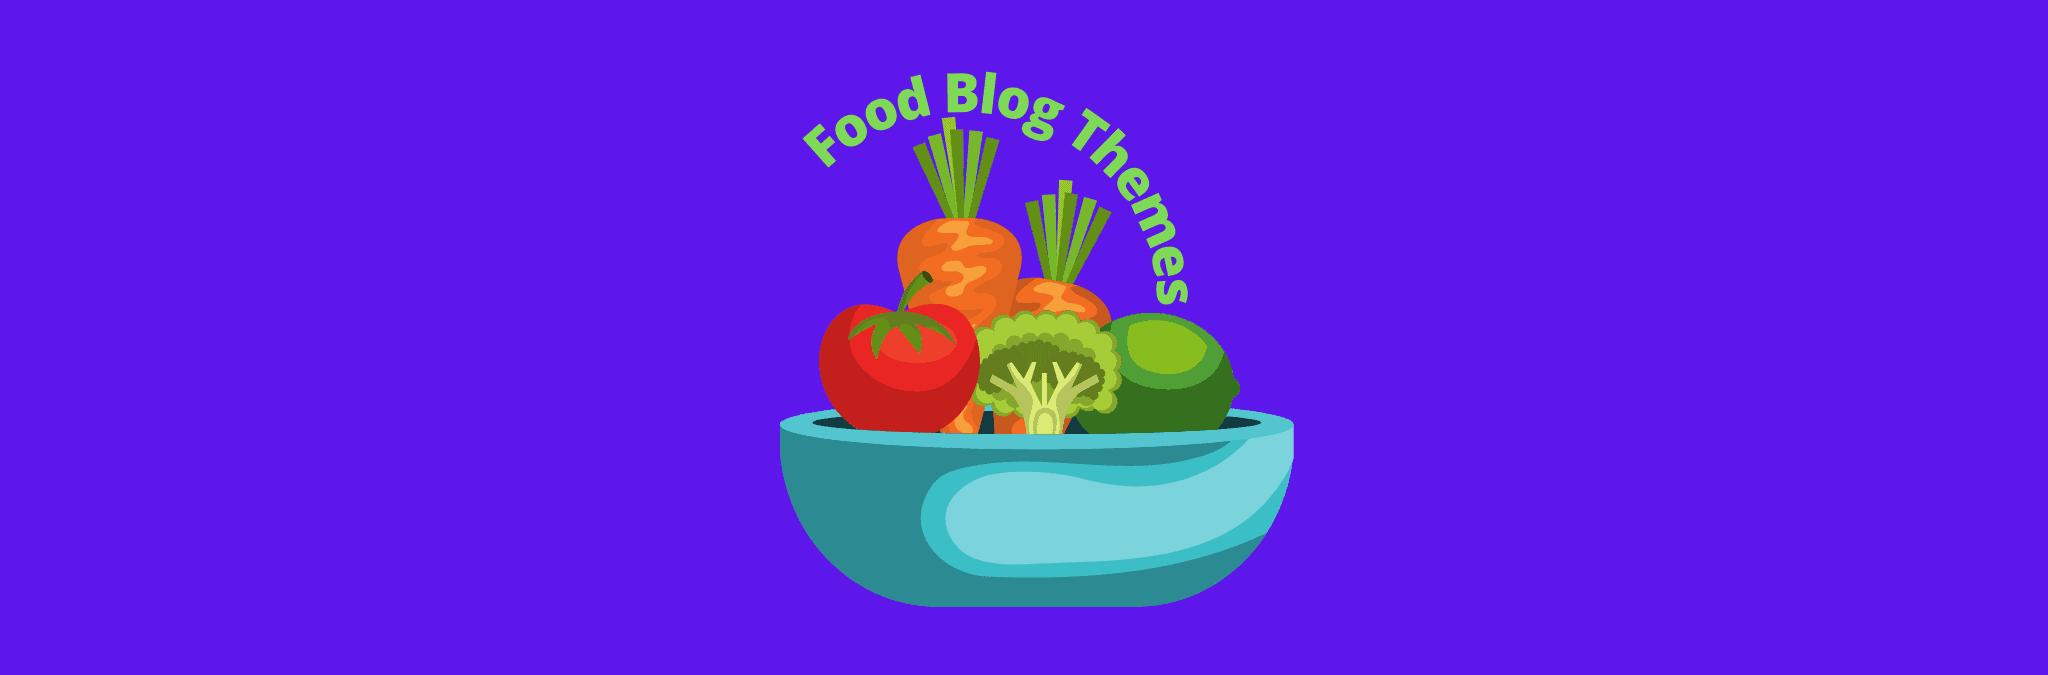 Best WordPress themes for food blog